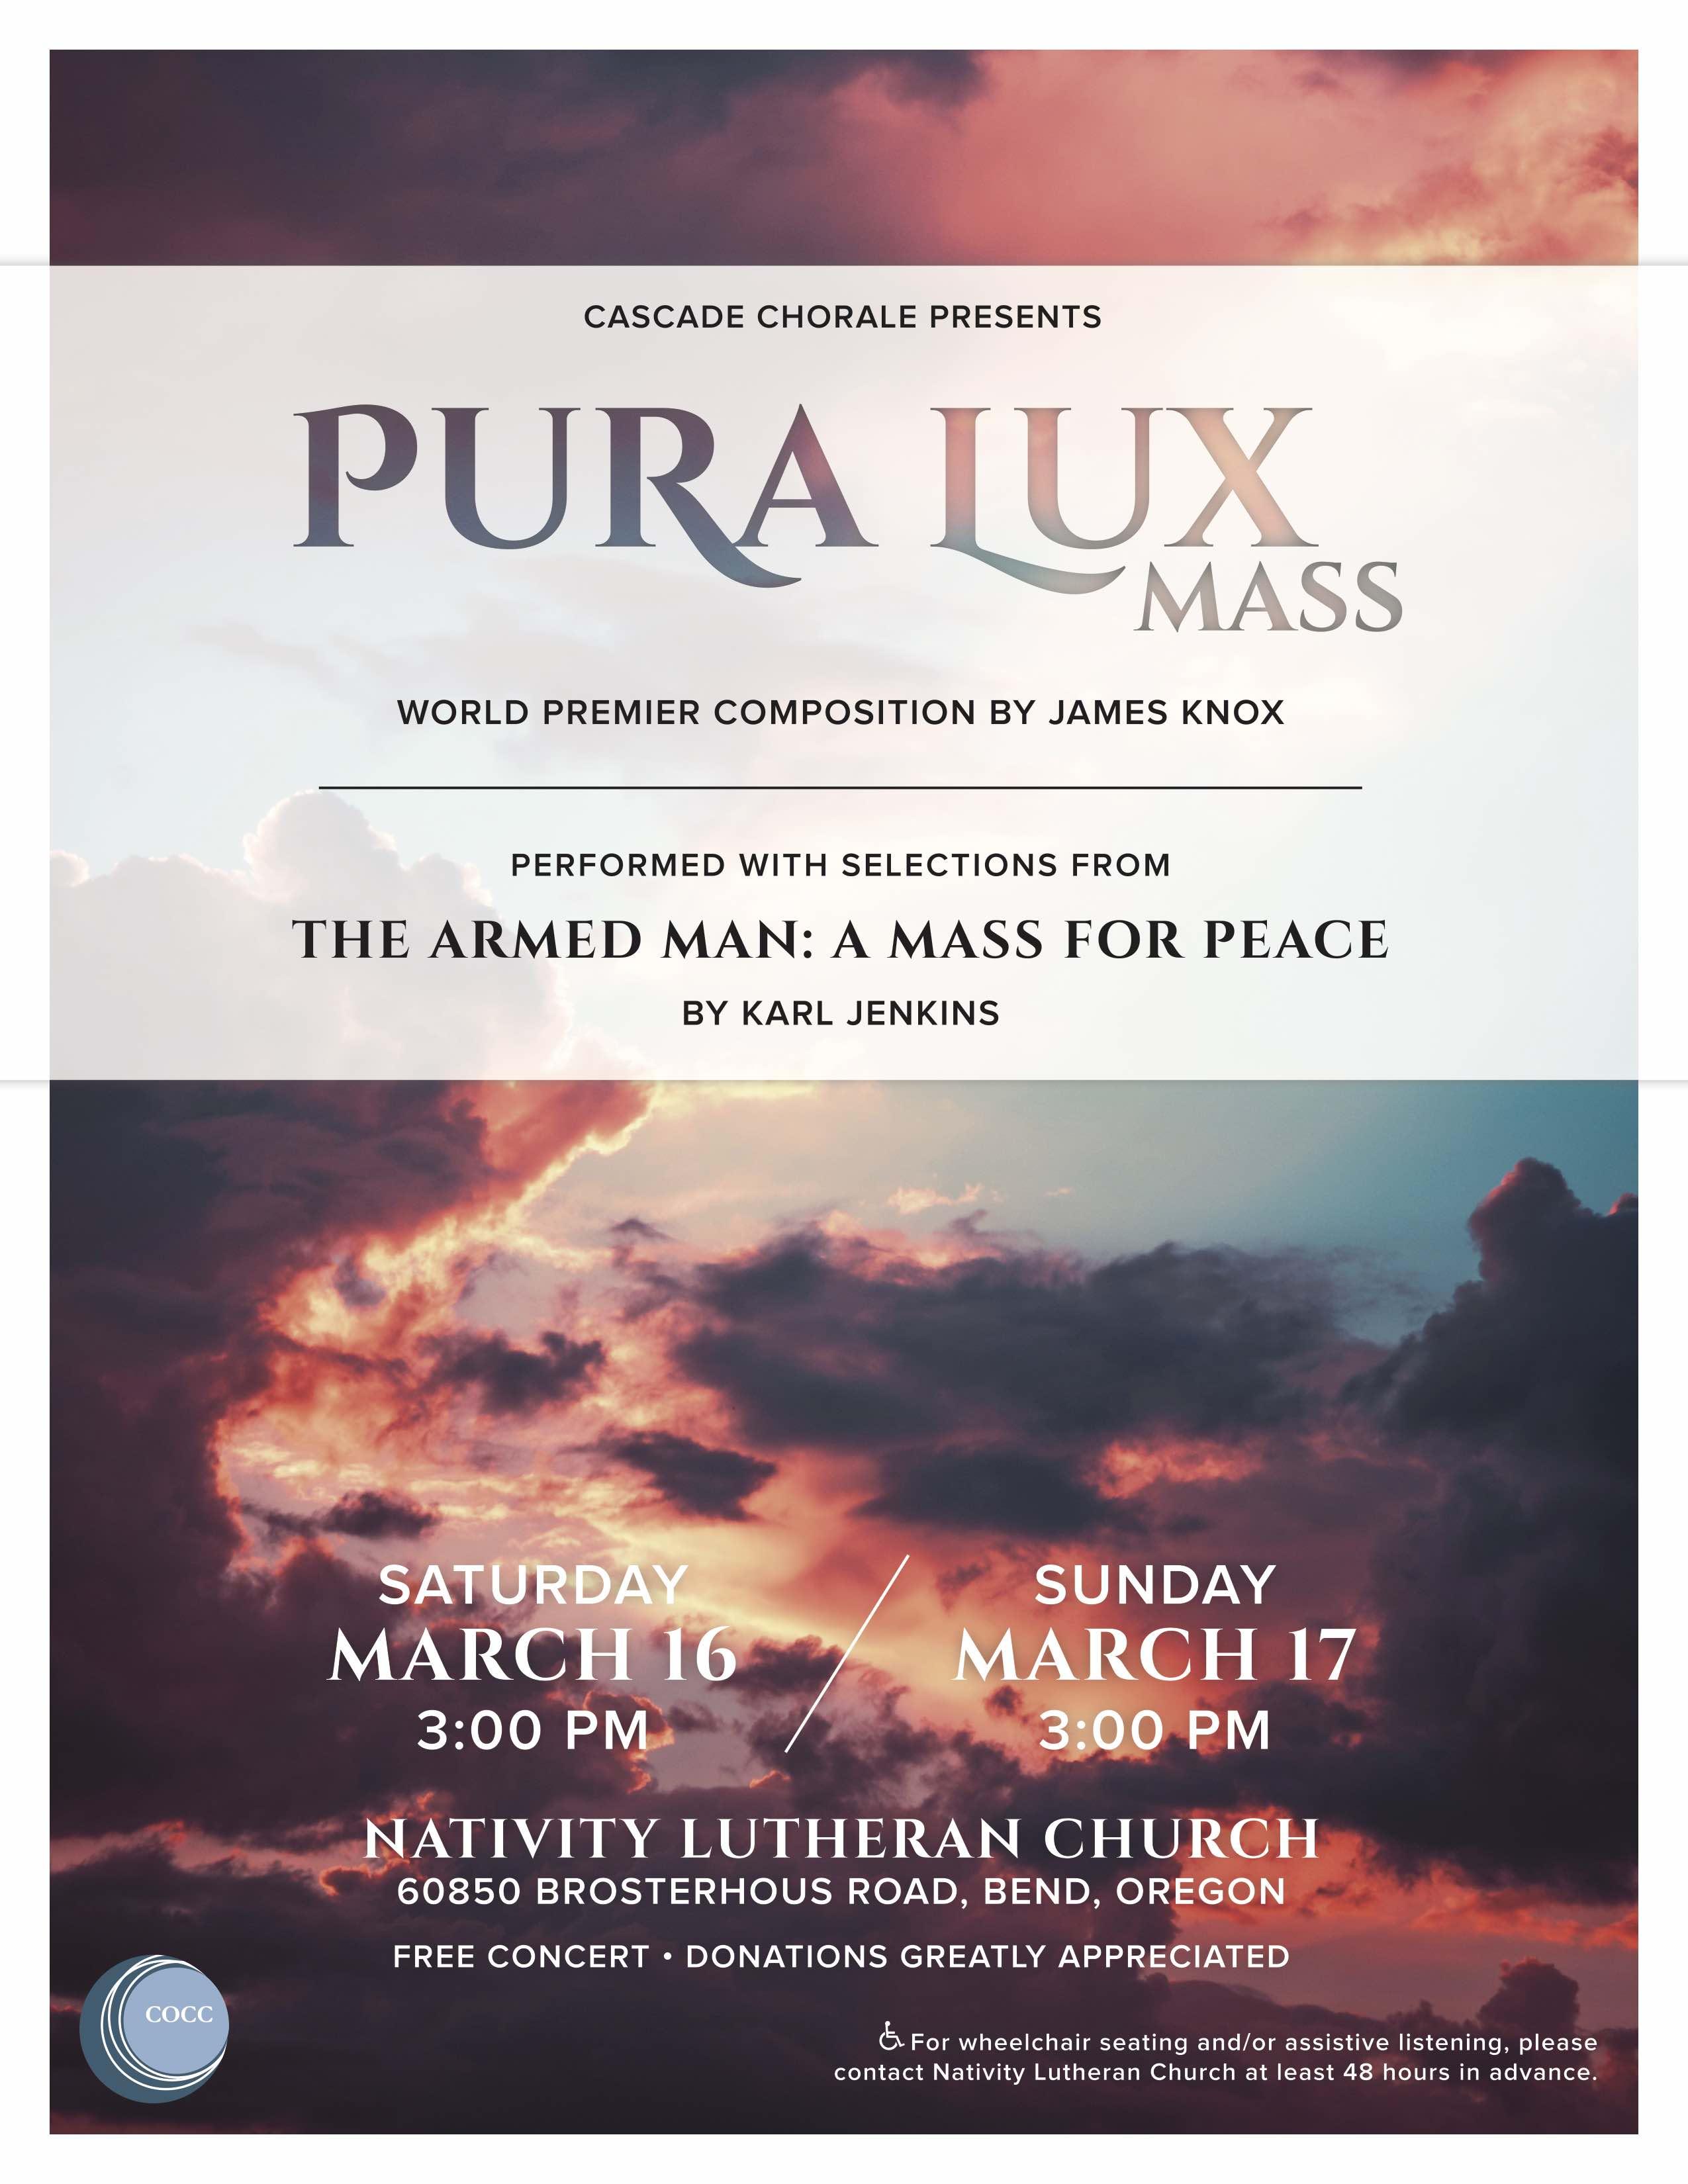 Cascade Chorale Present Pura Lux (Pure Light) @ Nativity Lutheran Church